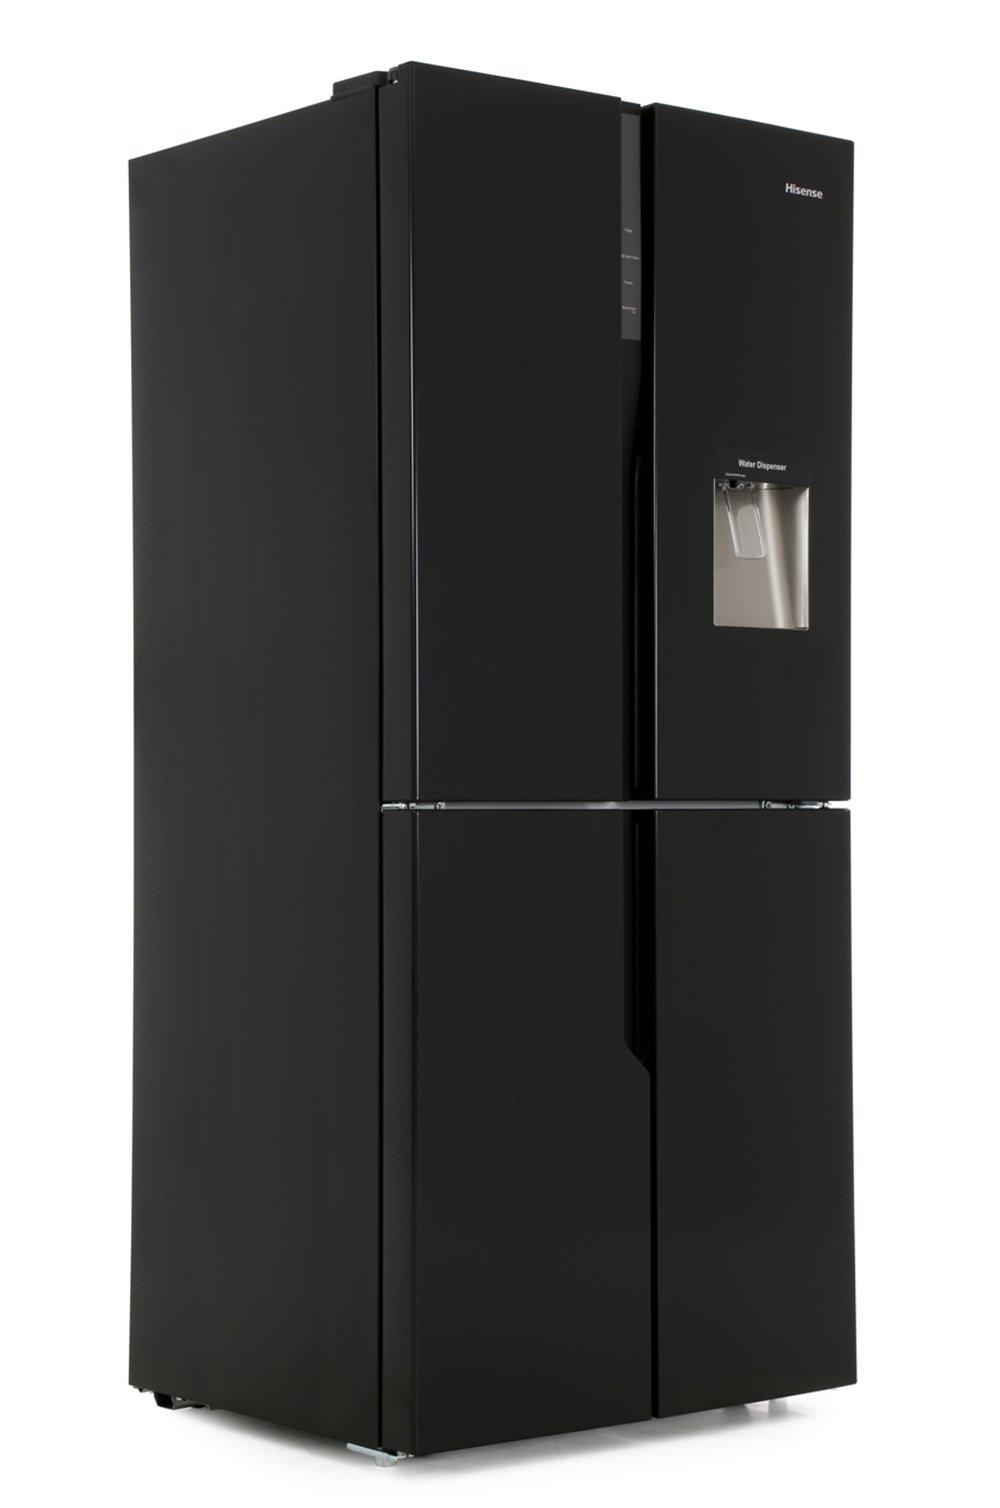 Hisense Rq560n4wb1 American Fridge Freezer